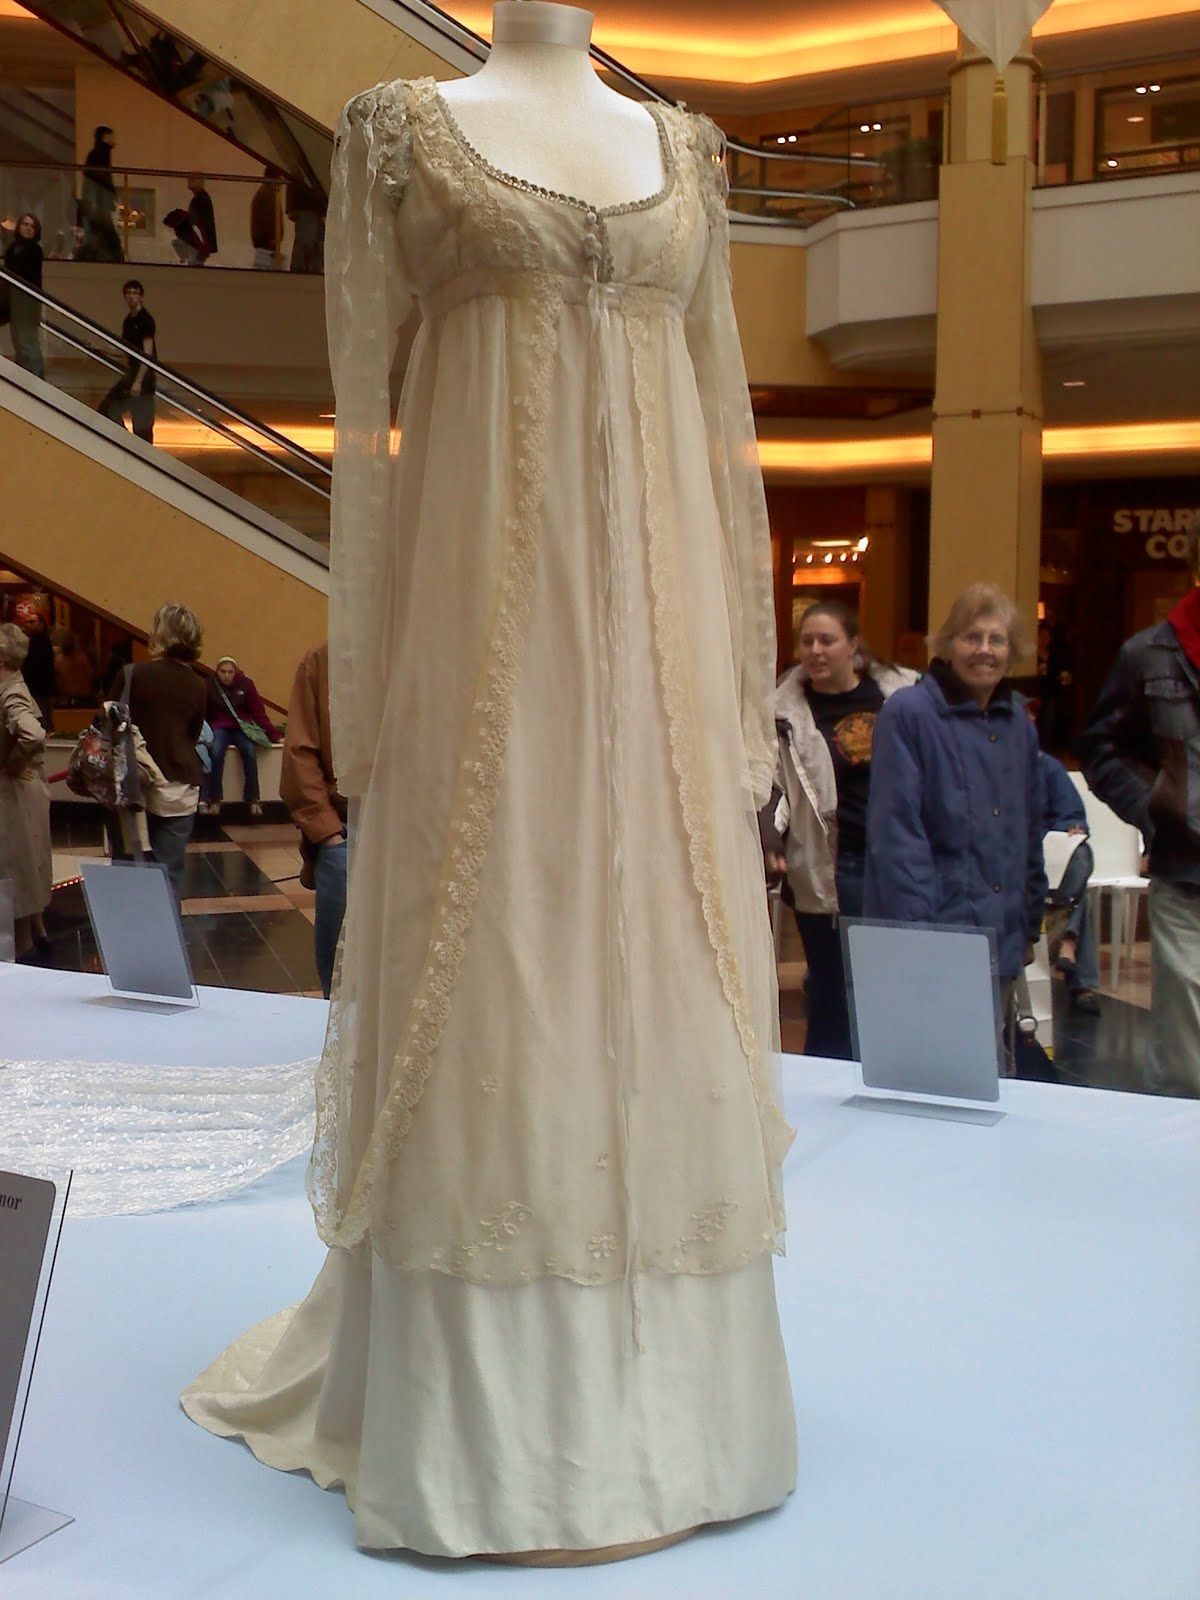 Perdy vestidos de noche pinterest wedding dress gowns and